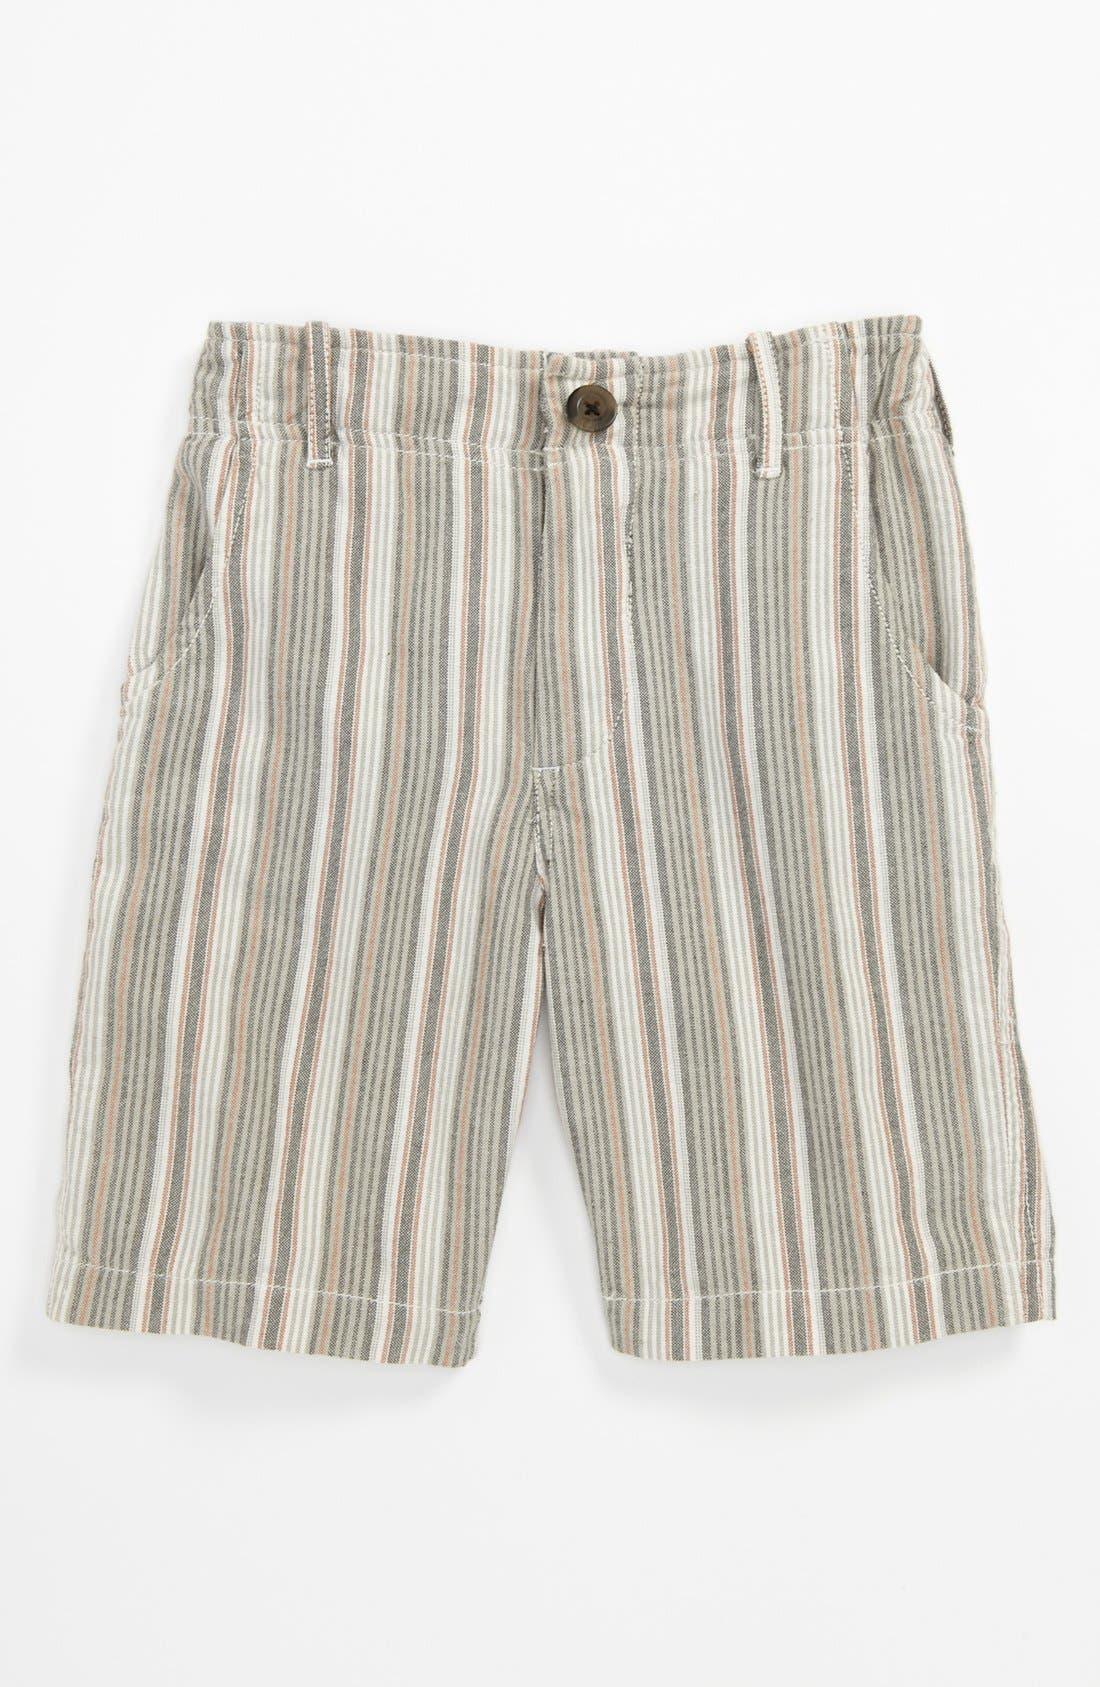 Main Image - Peek 'Benito' Stripe Shorts (Big Boys)